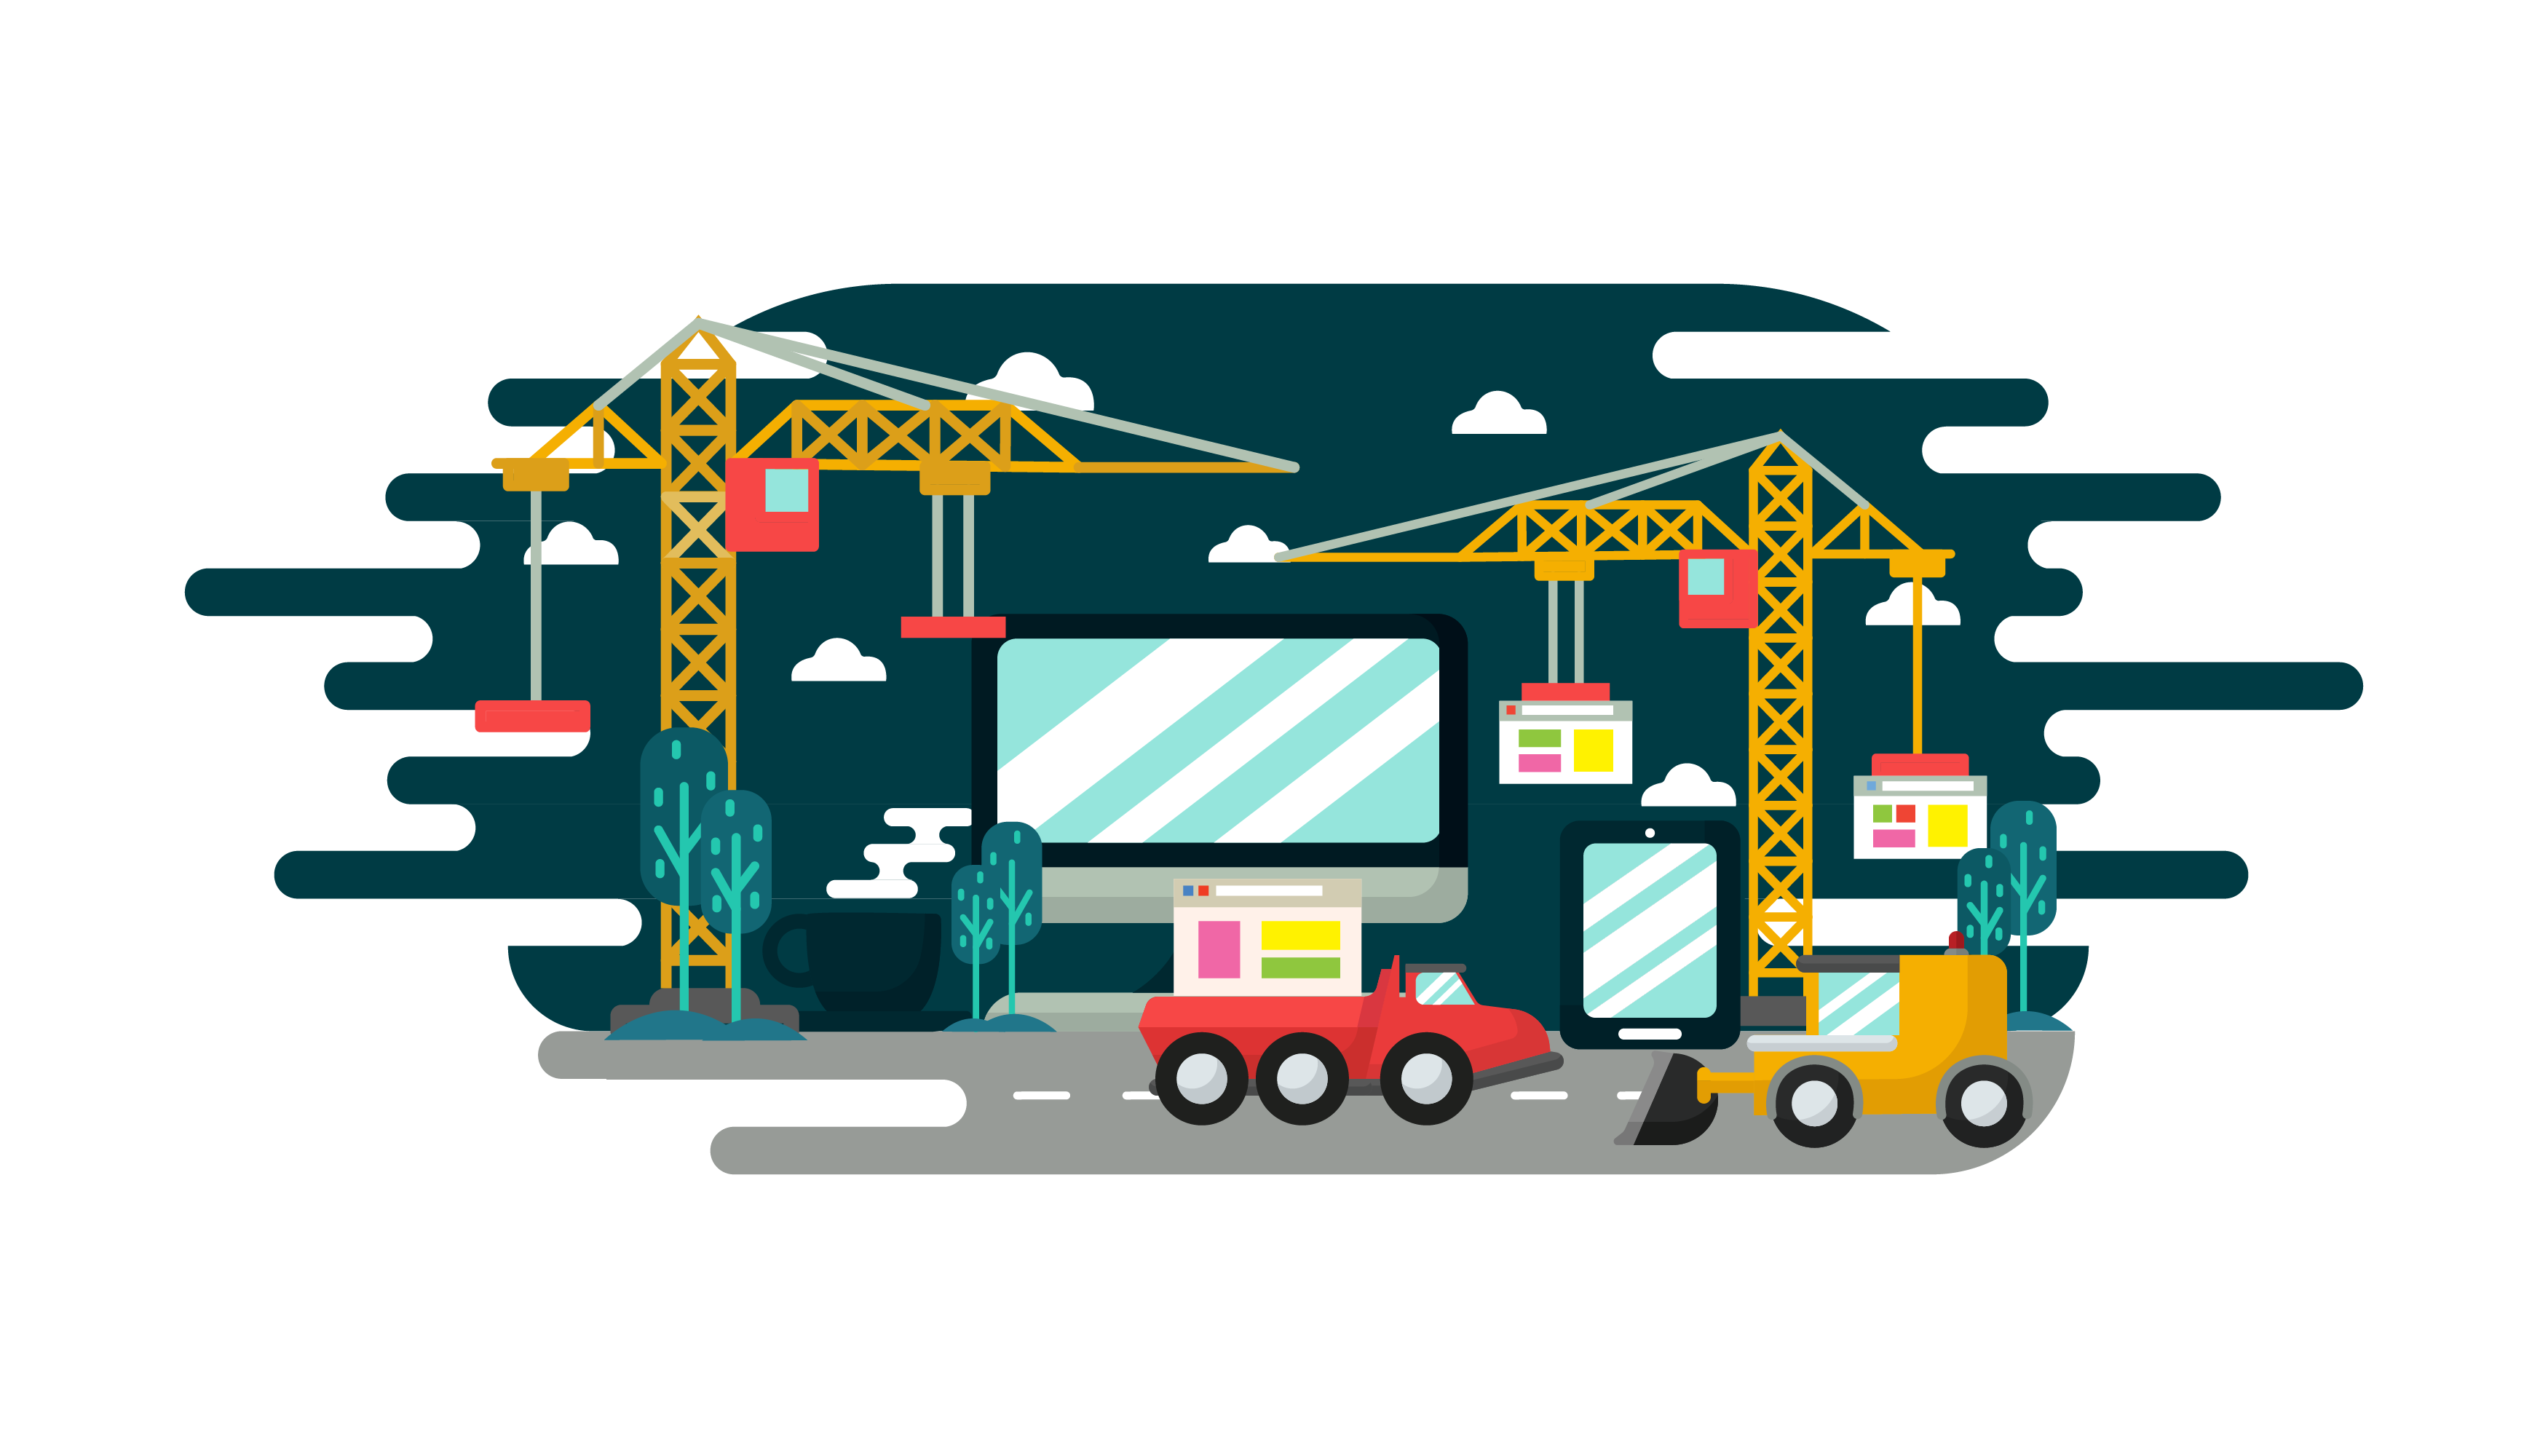 Website Under Construction Vector.